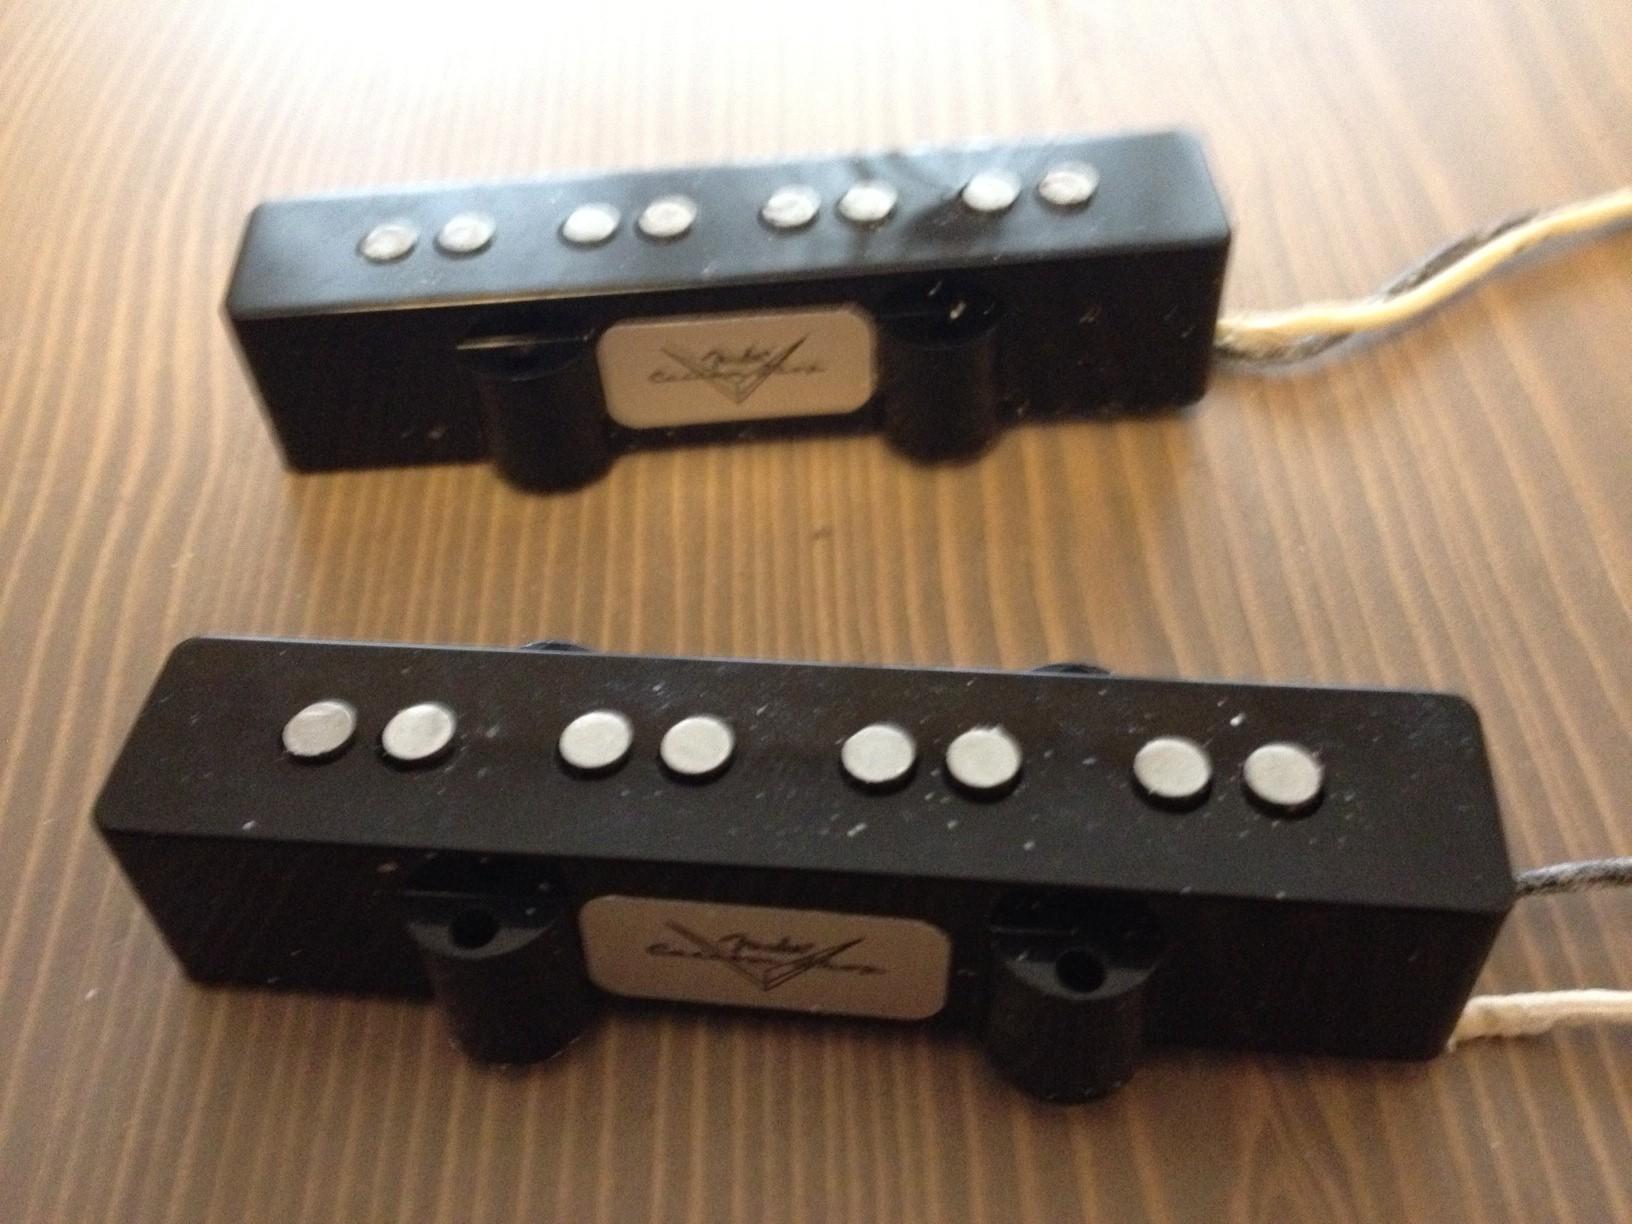 fender custom shop custom 39 60 jazz bass pickups image 328706 audiofanzine. Black Bedroom Furniture Sets. Home Design Ideas